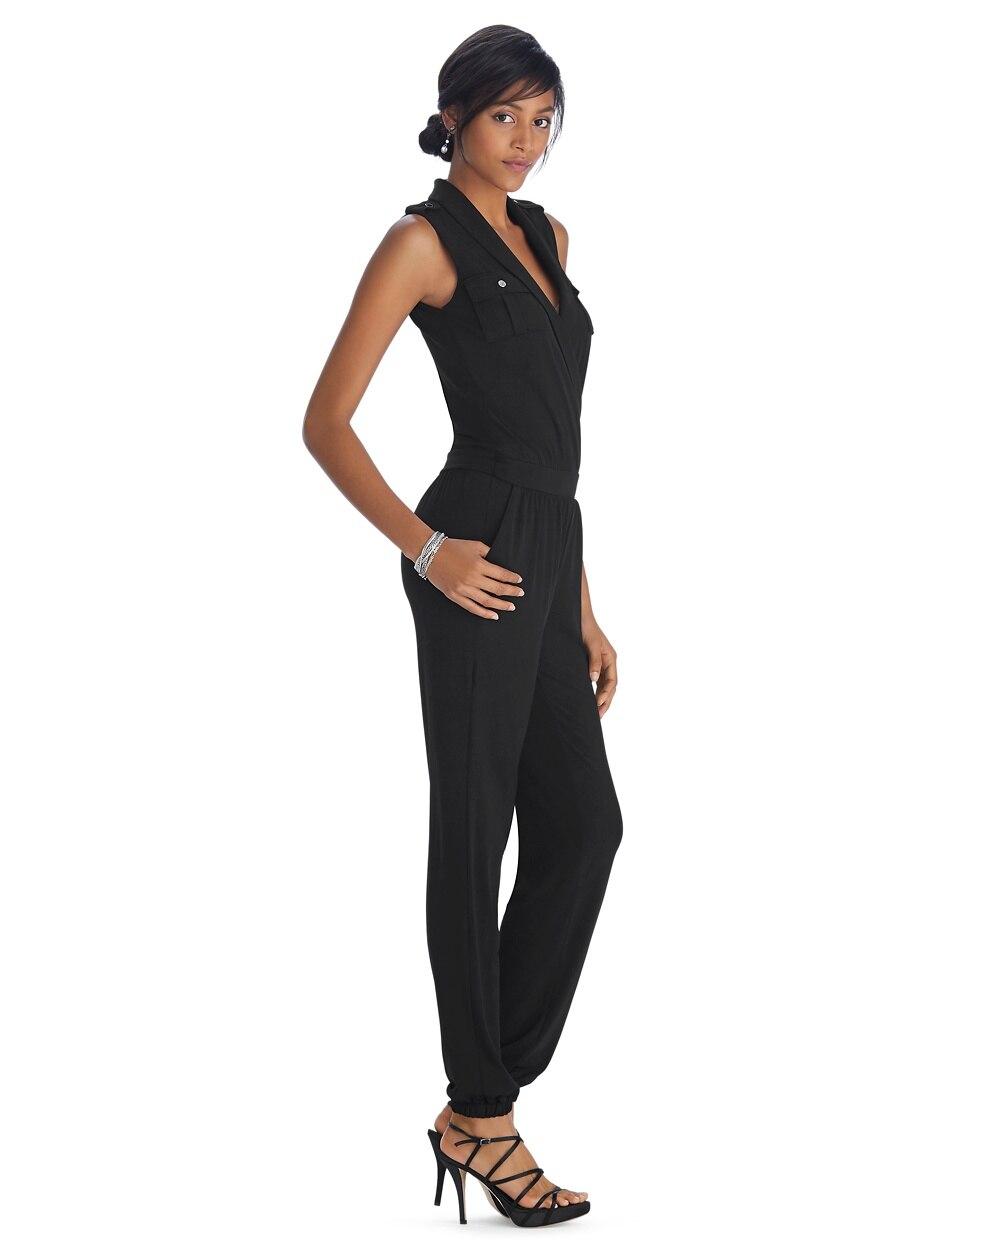 713d729ec70f Return to thumbnail image selection Sleeveless Shawl Collar Black Jumpsuit